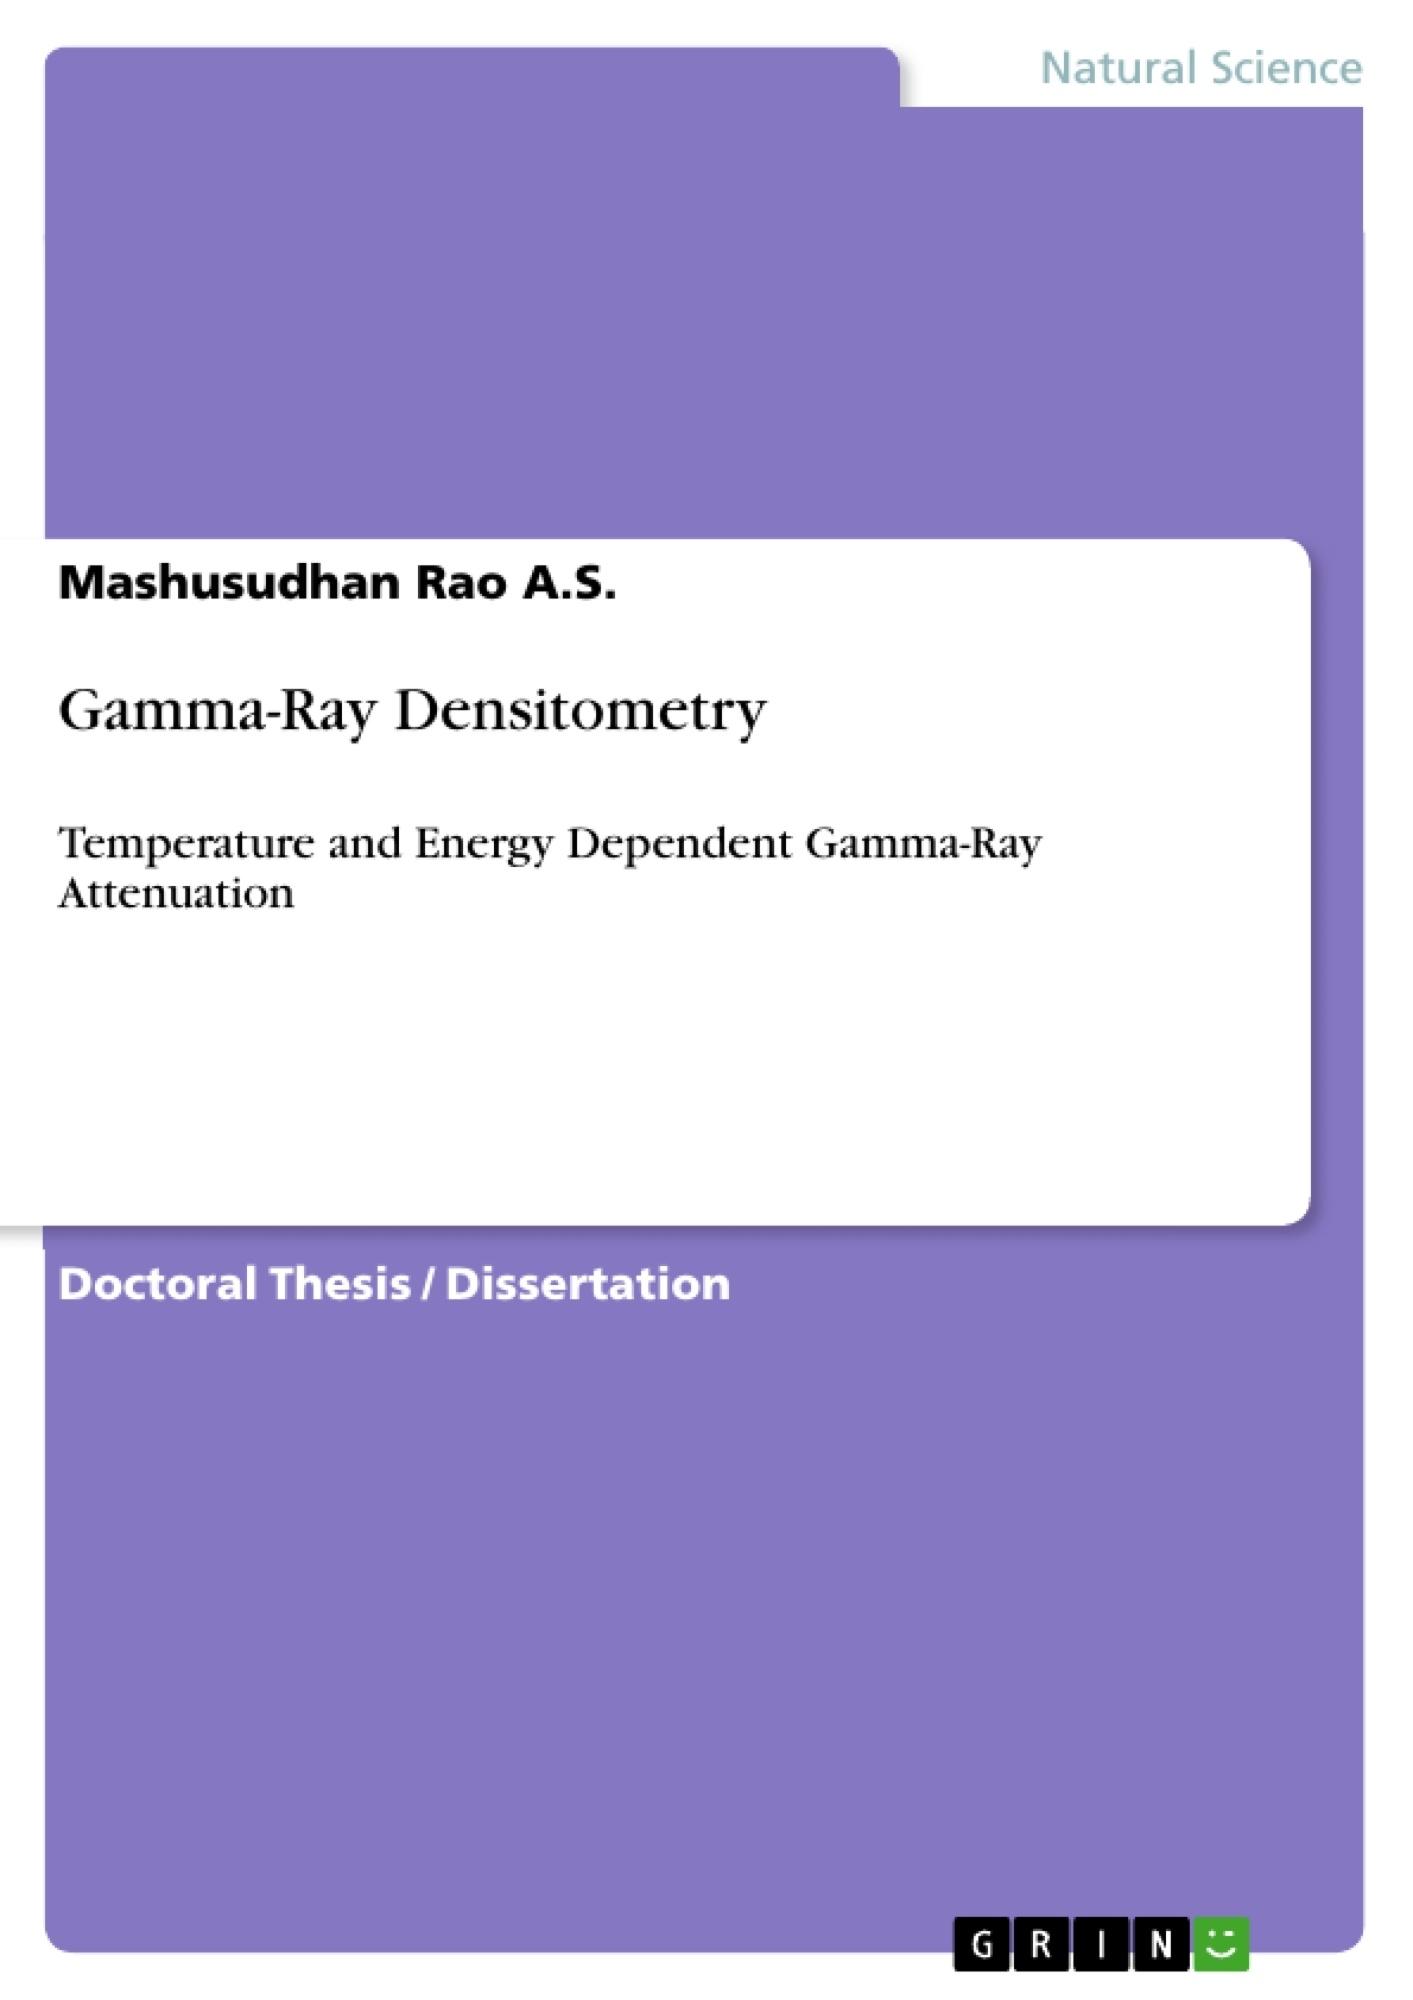 Title: Gamma-Ray Densitometry